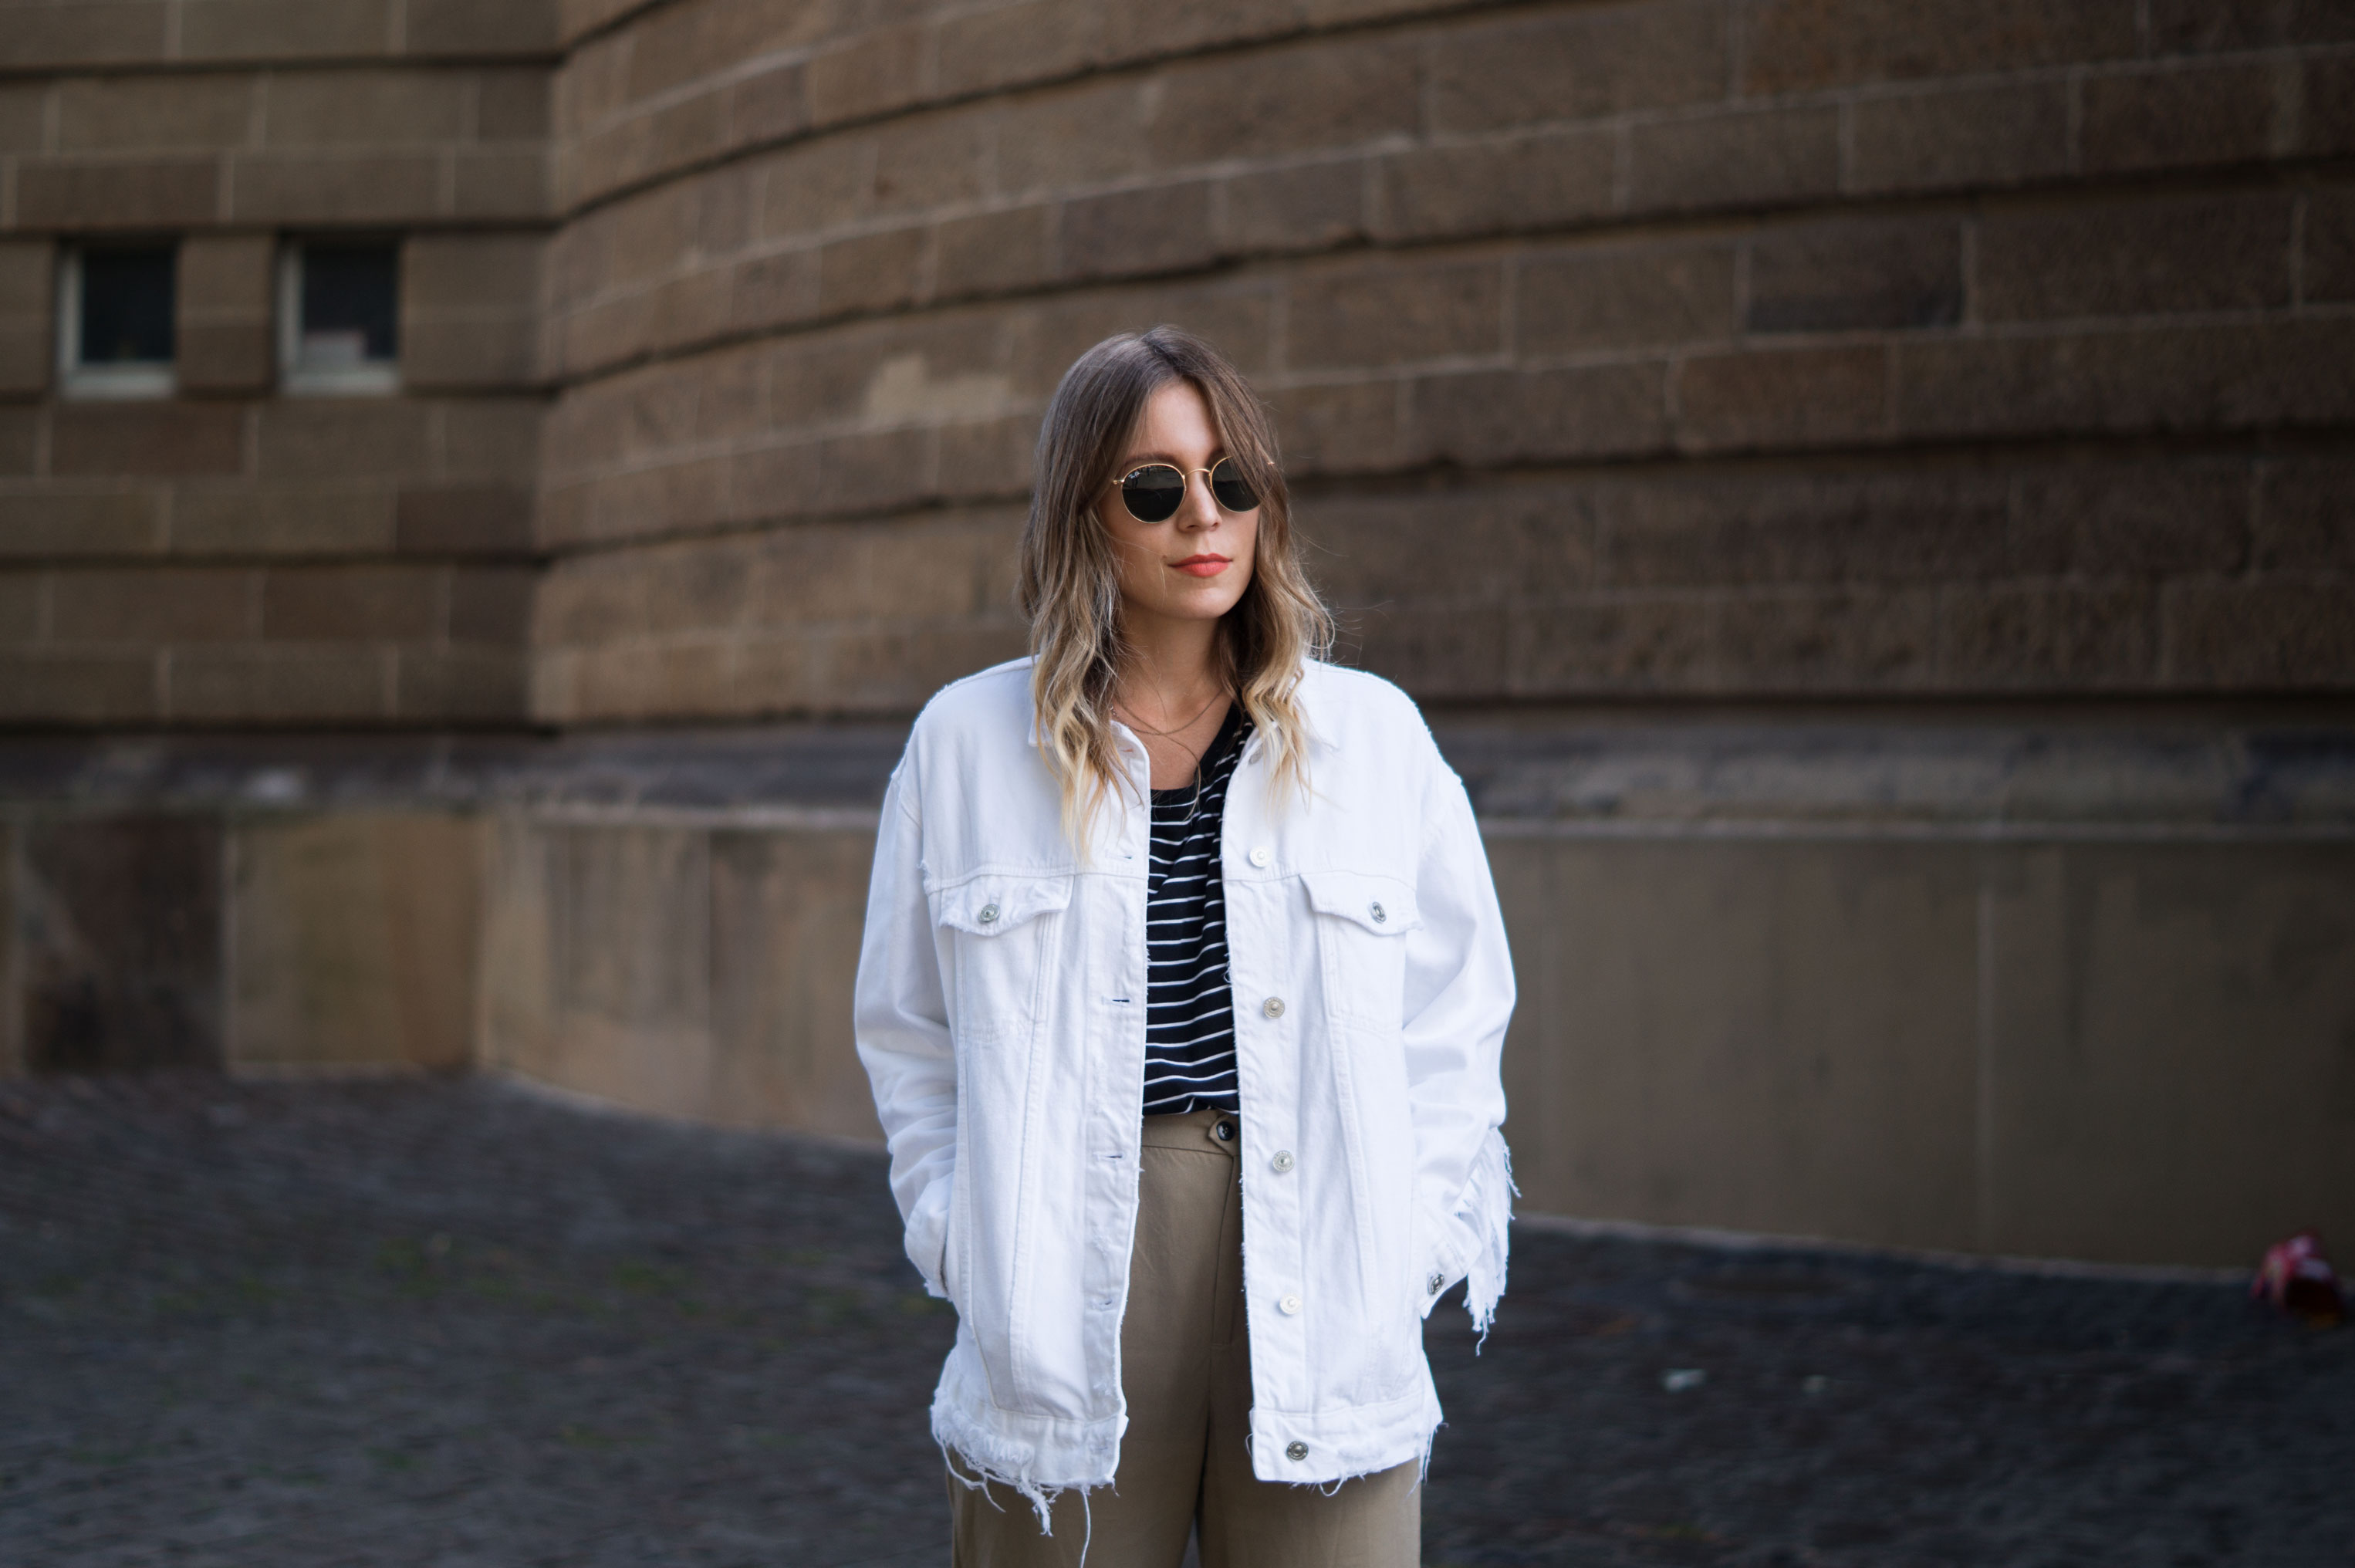 Fringed Denim Jacket Fransenjacke weiße Jeansjacke Casual Outfit Sariety Fashionblogger Modeblog Heidelberg Mannheim Wasserturm-3